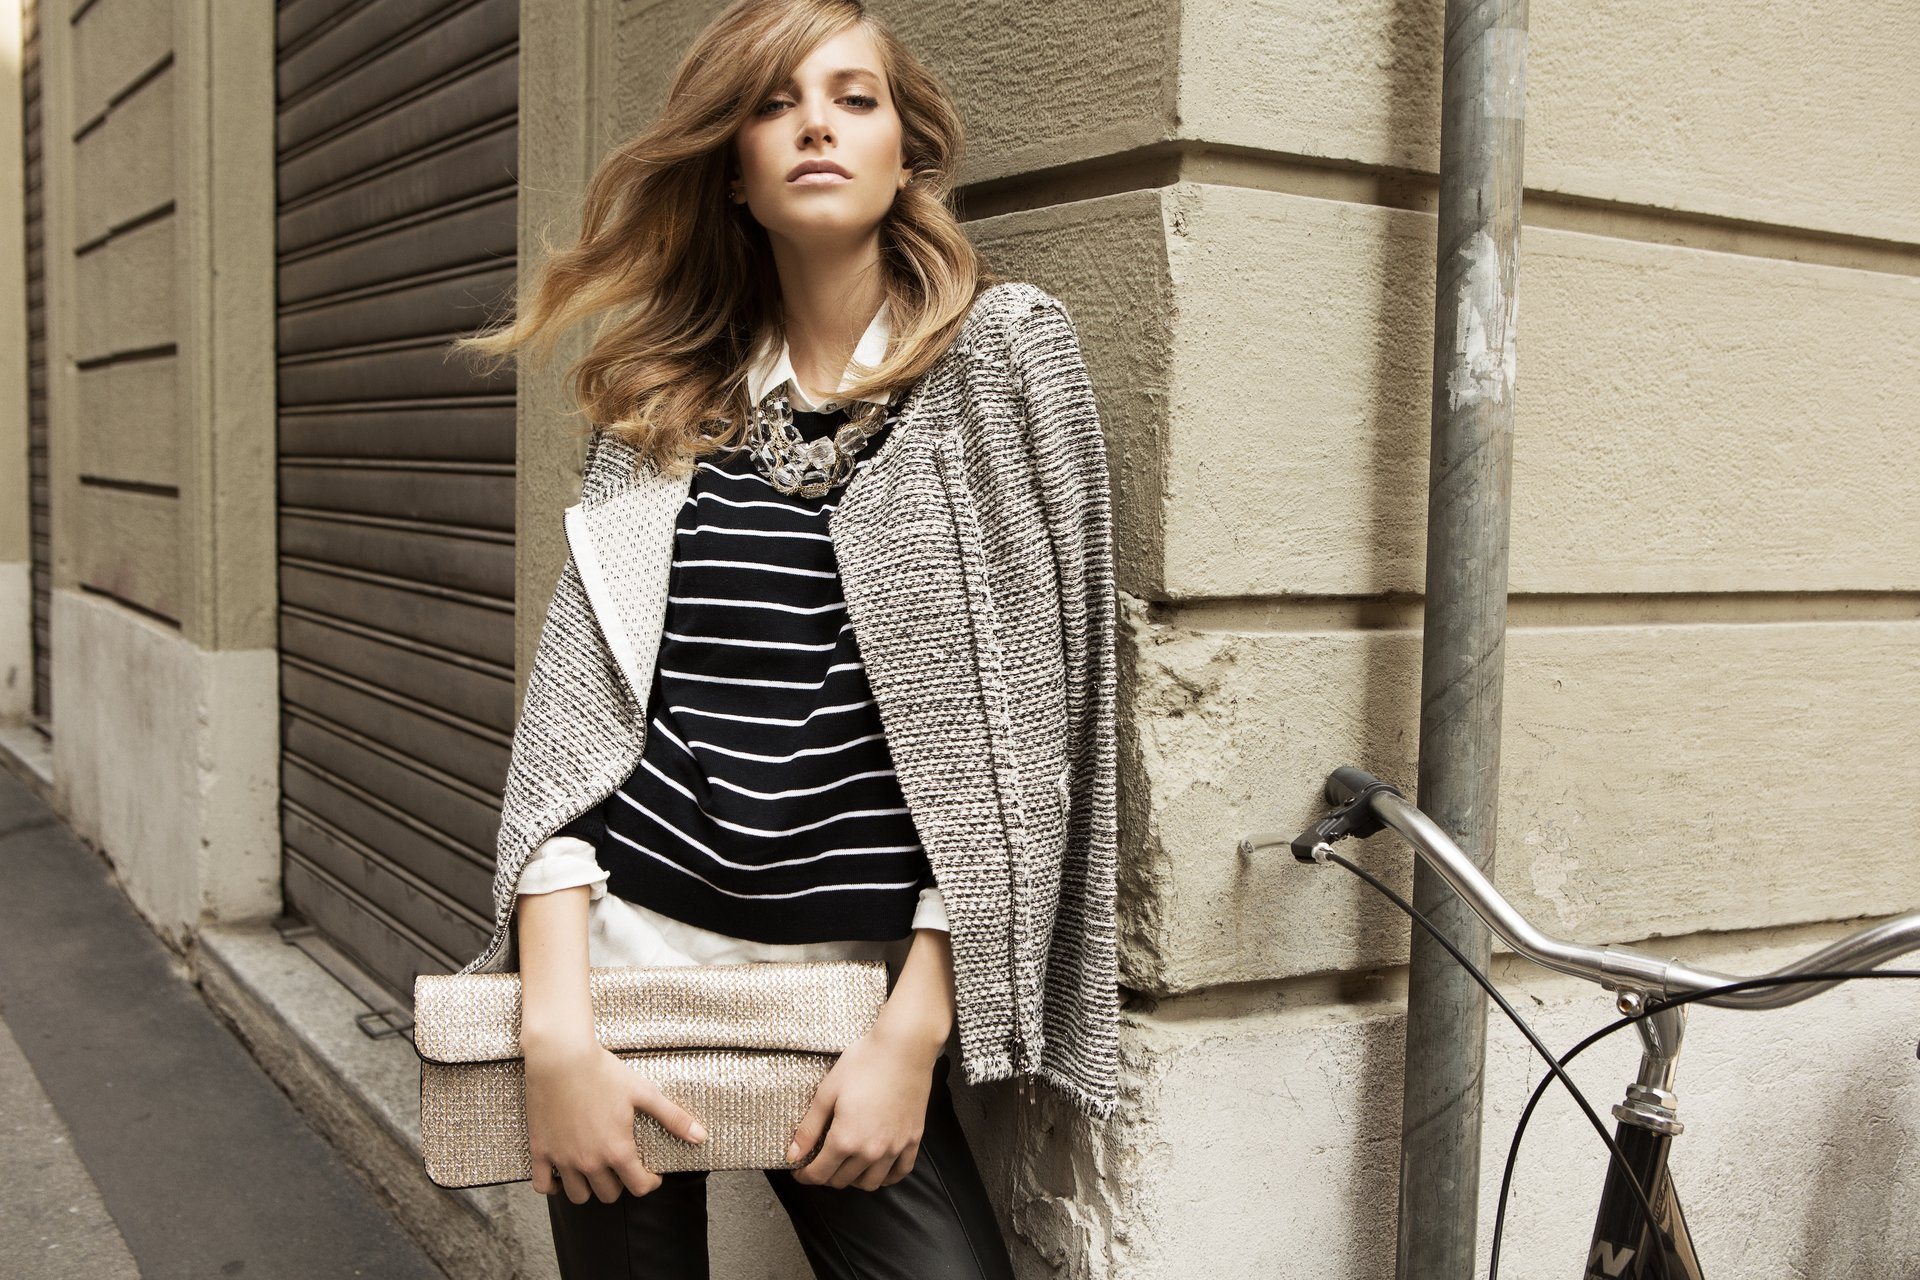 Hair & Make-up: Melanie Volkart Photographer: Ellin Anderegg Model: Alba @ Brave Models Milano